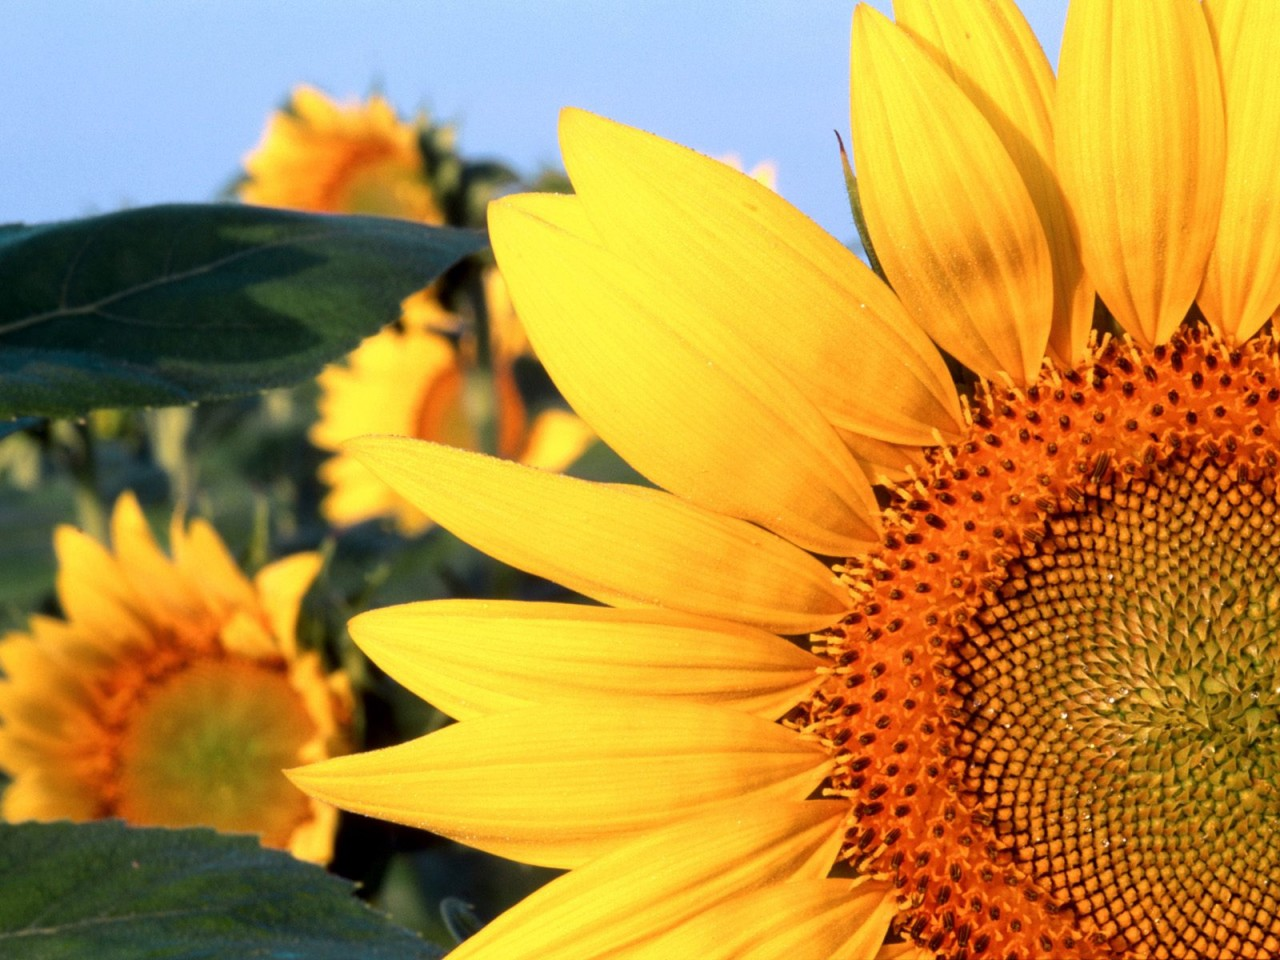 sunflowers-in-nebraska_1280x960